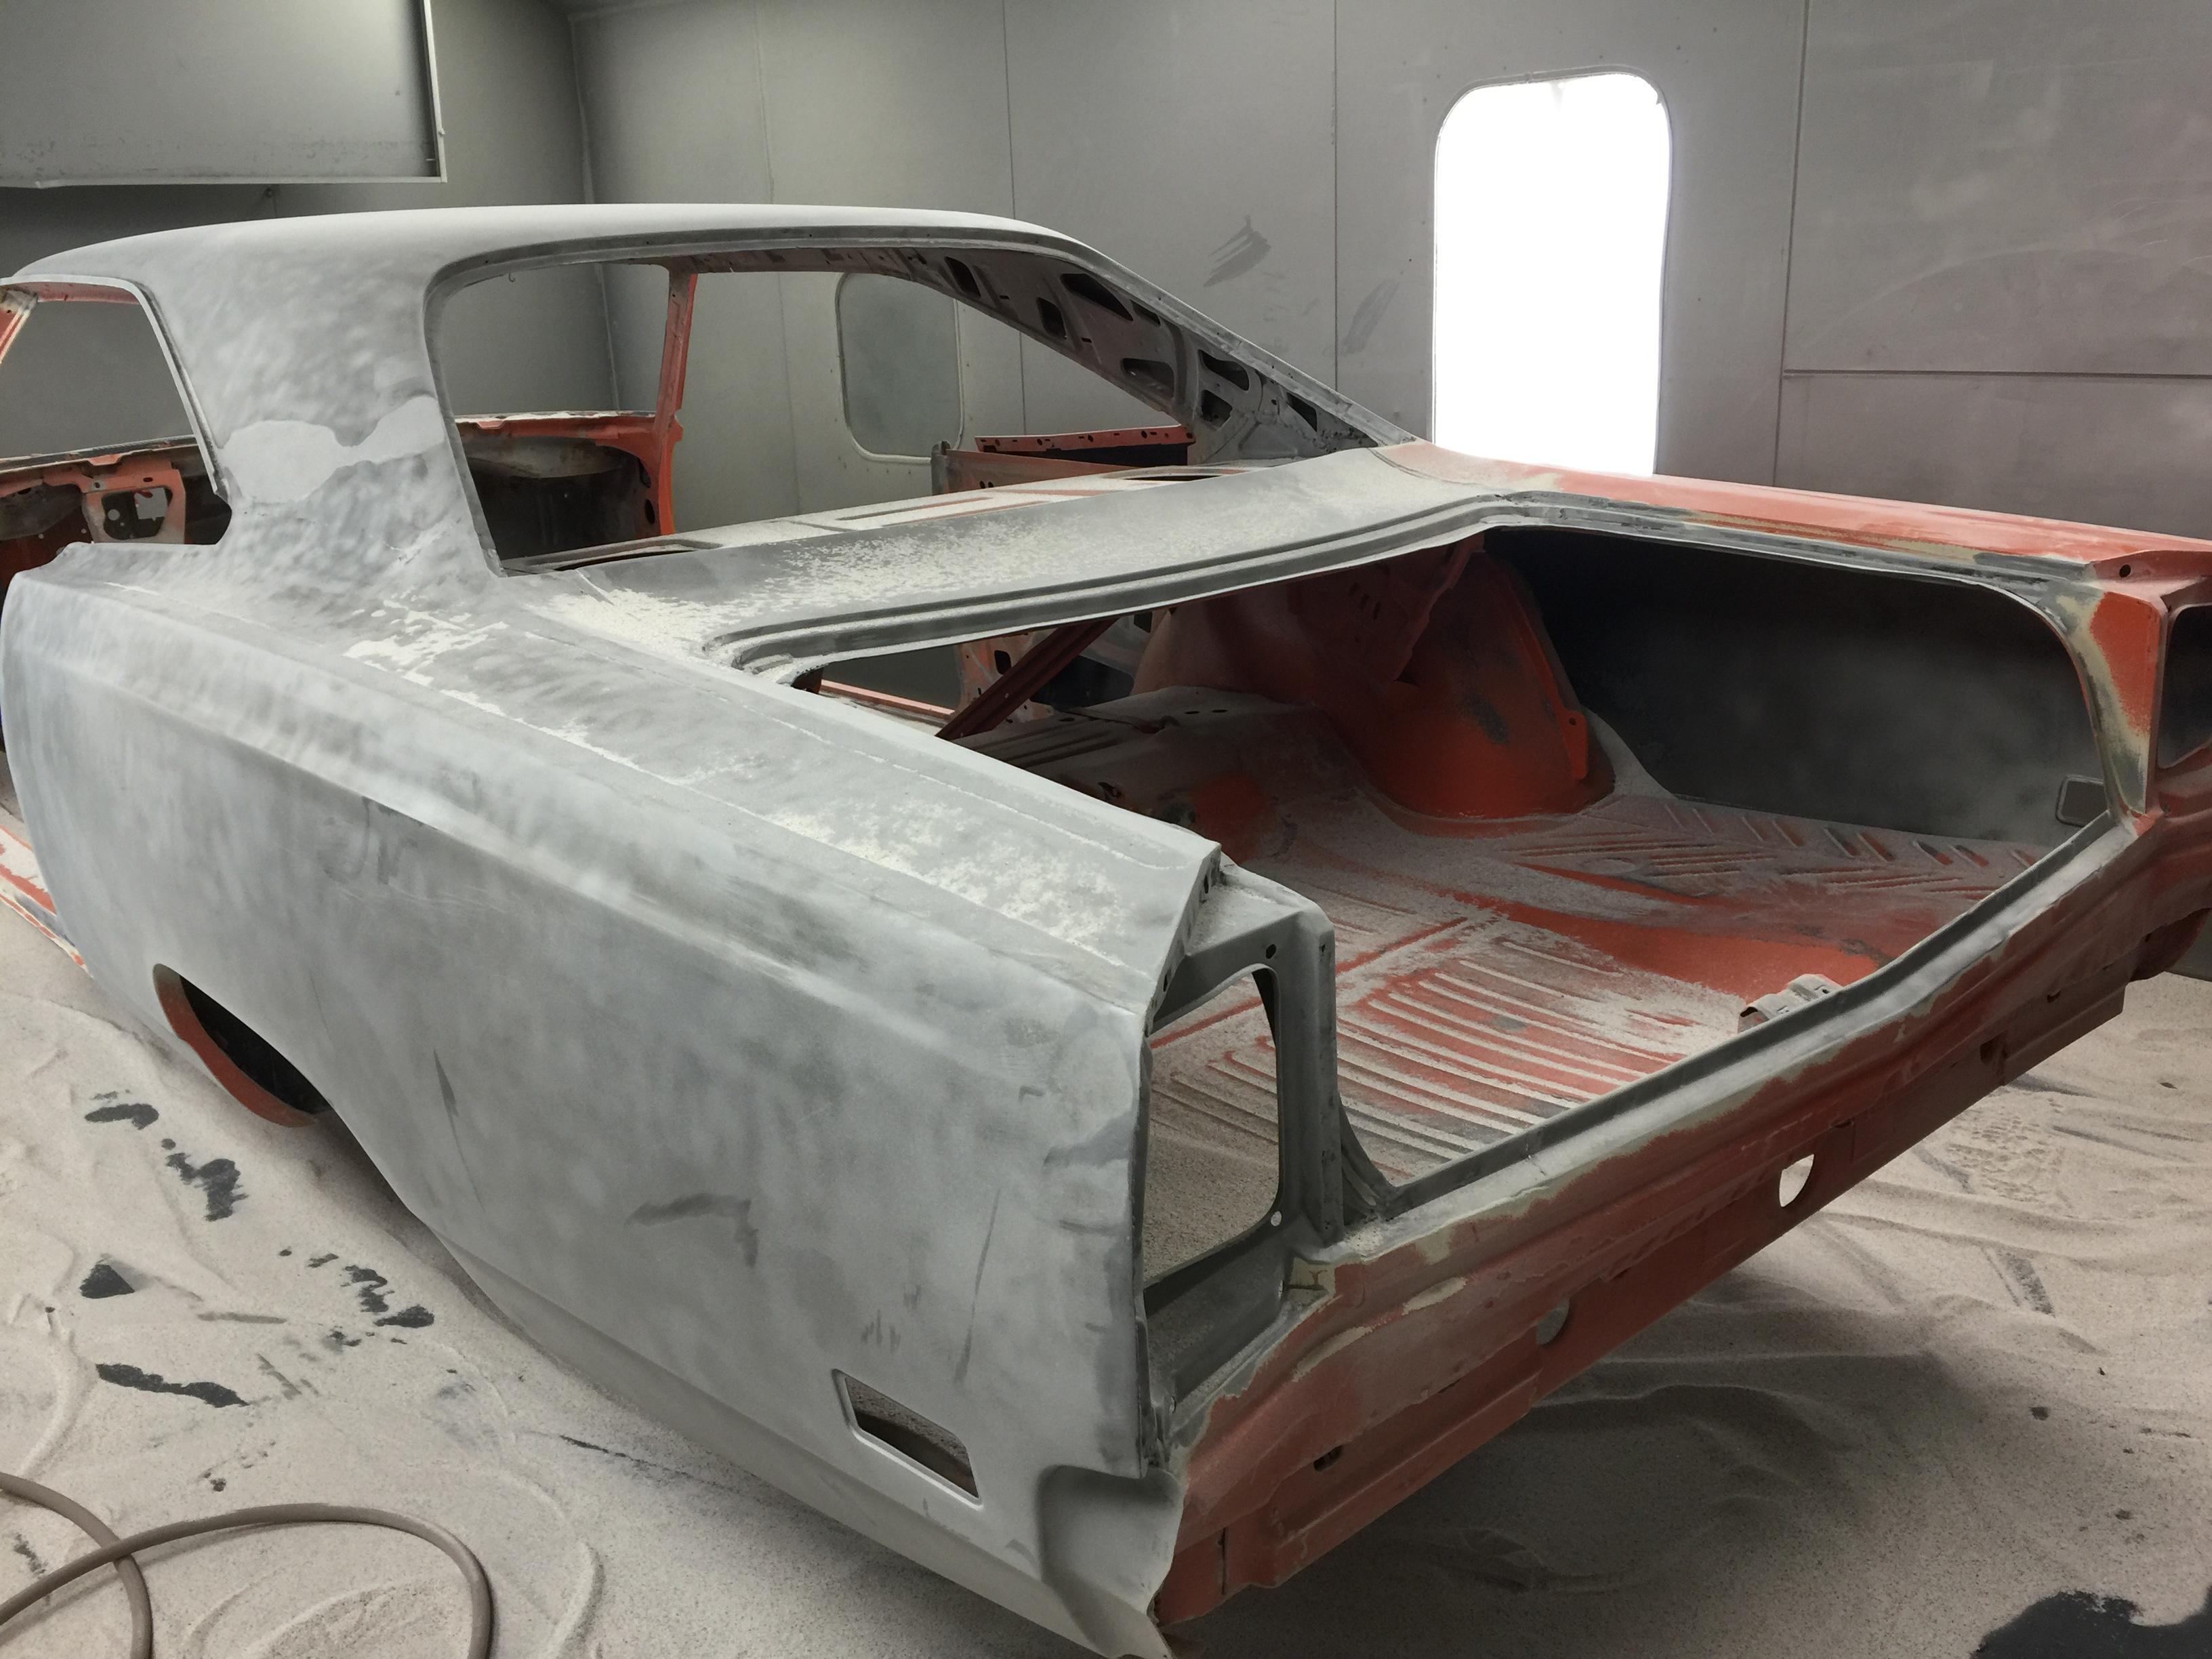 Media Blasting (sandblasting) a 1969 Roadrunner